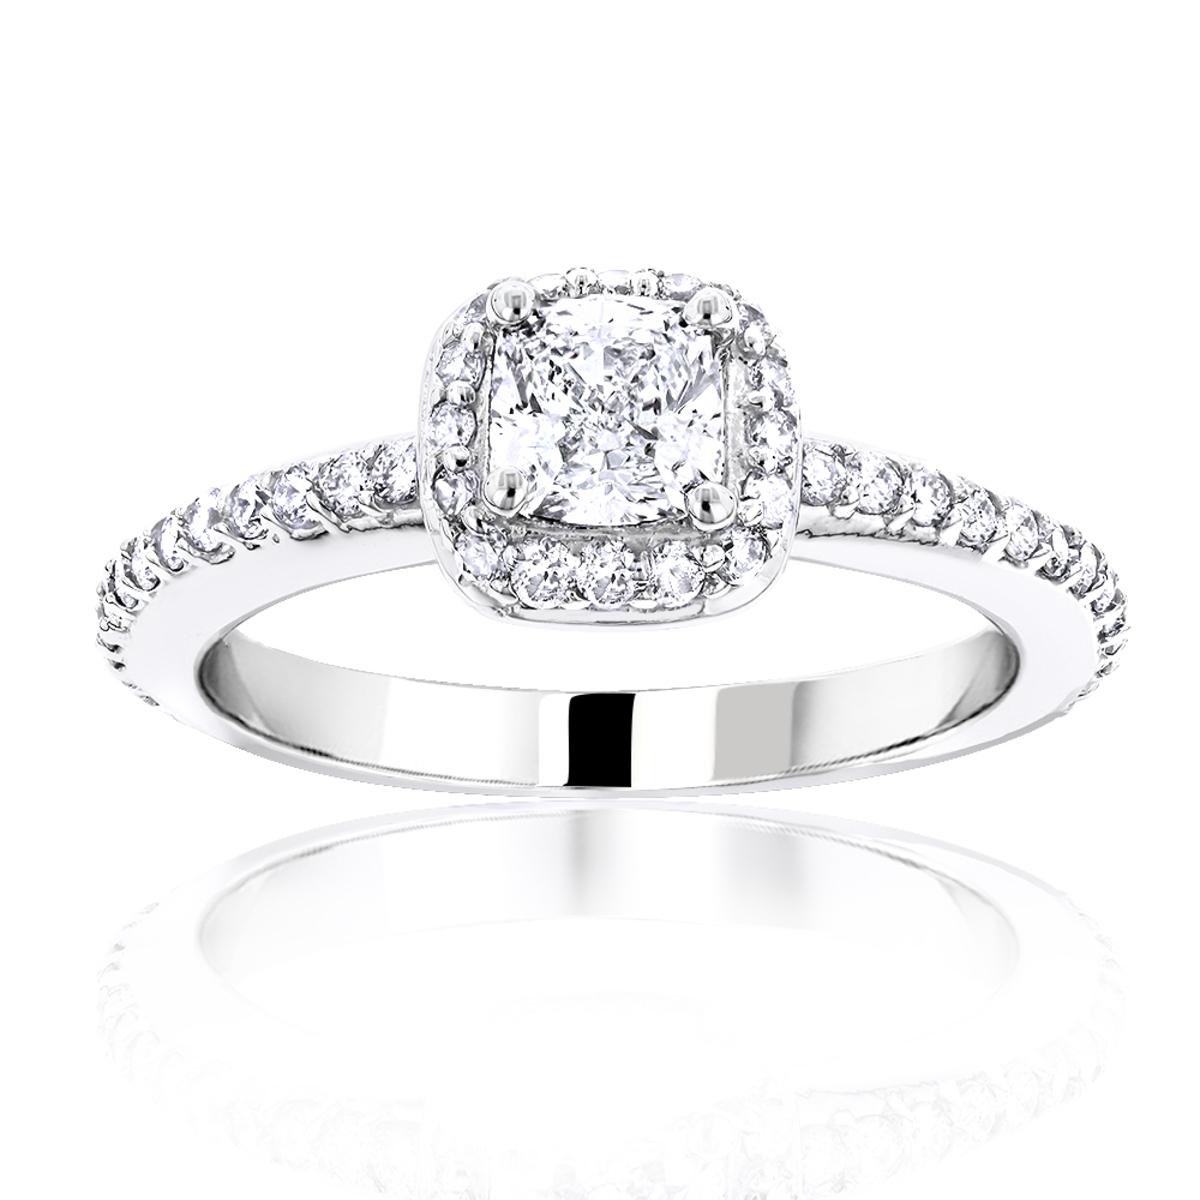 1 carat cushion cut diamond engagement ring 14k gold halo